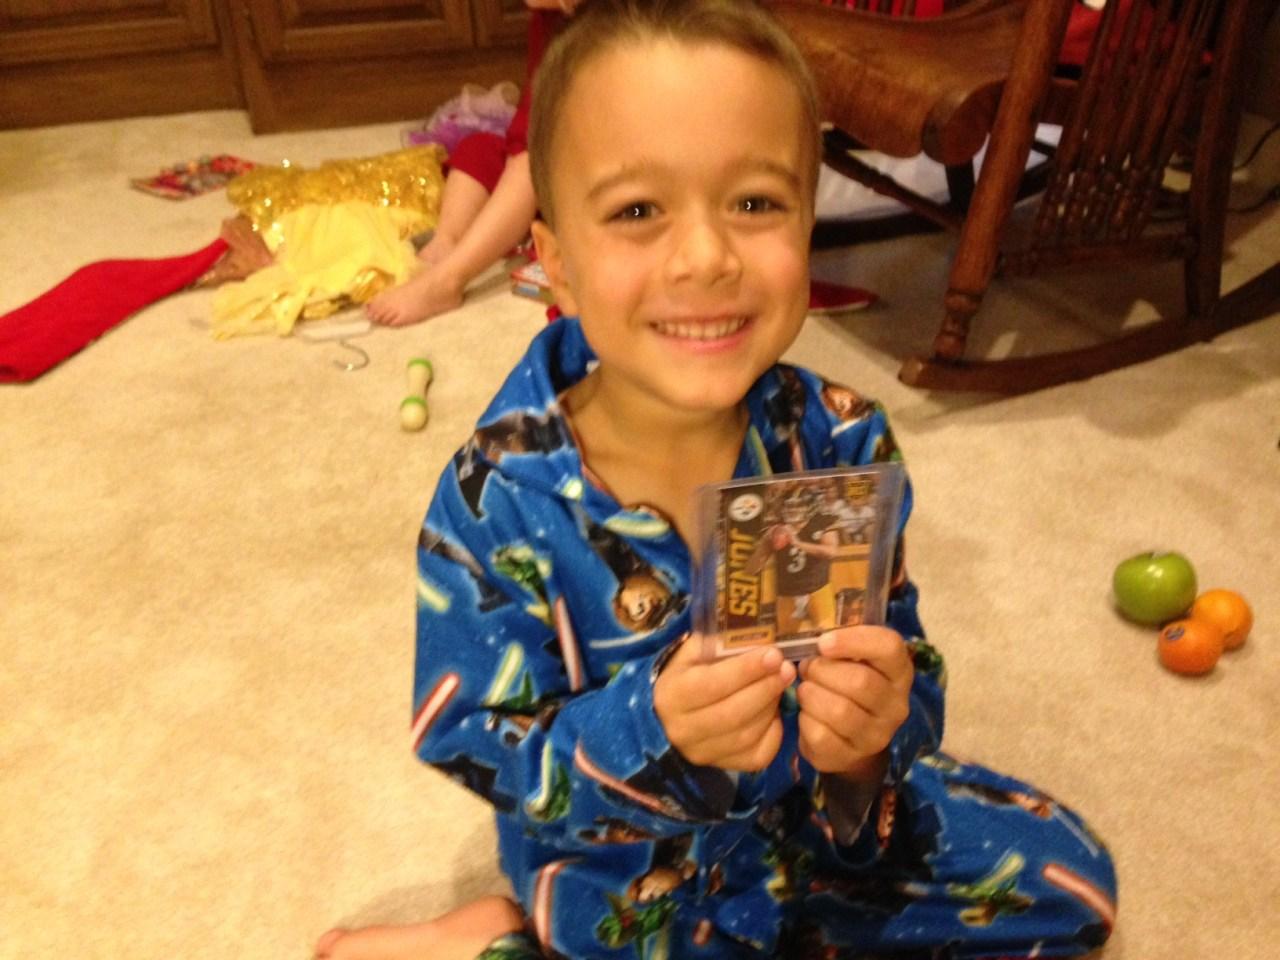 Josh with his new Landry Jones Rookie Card.